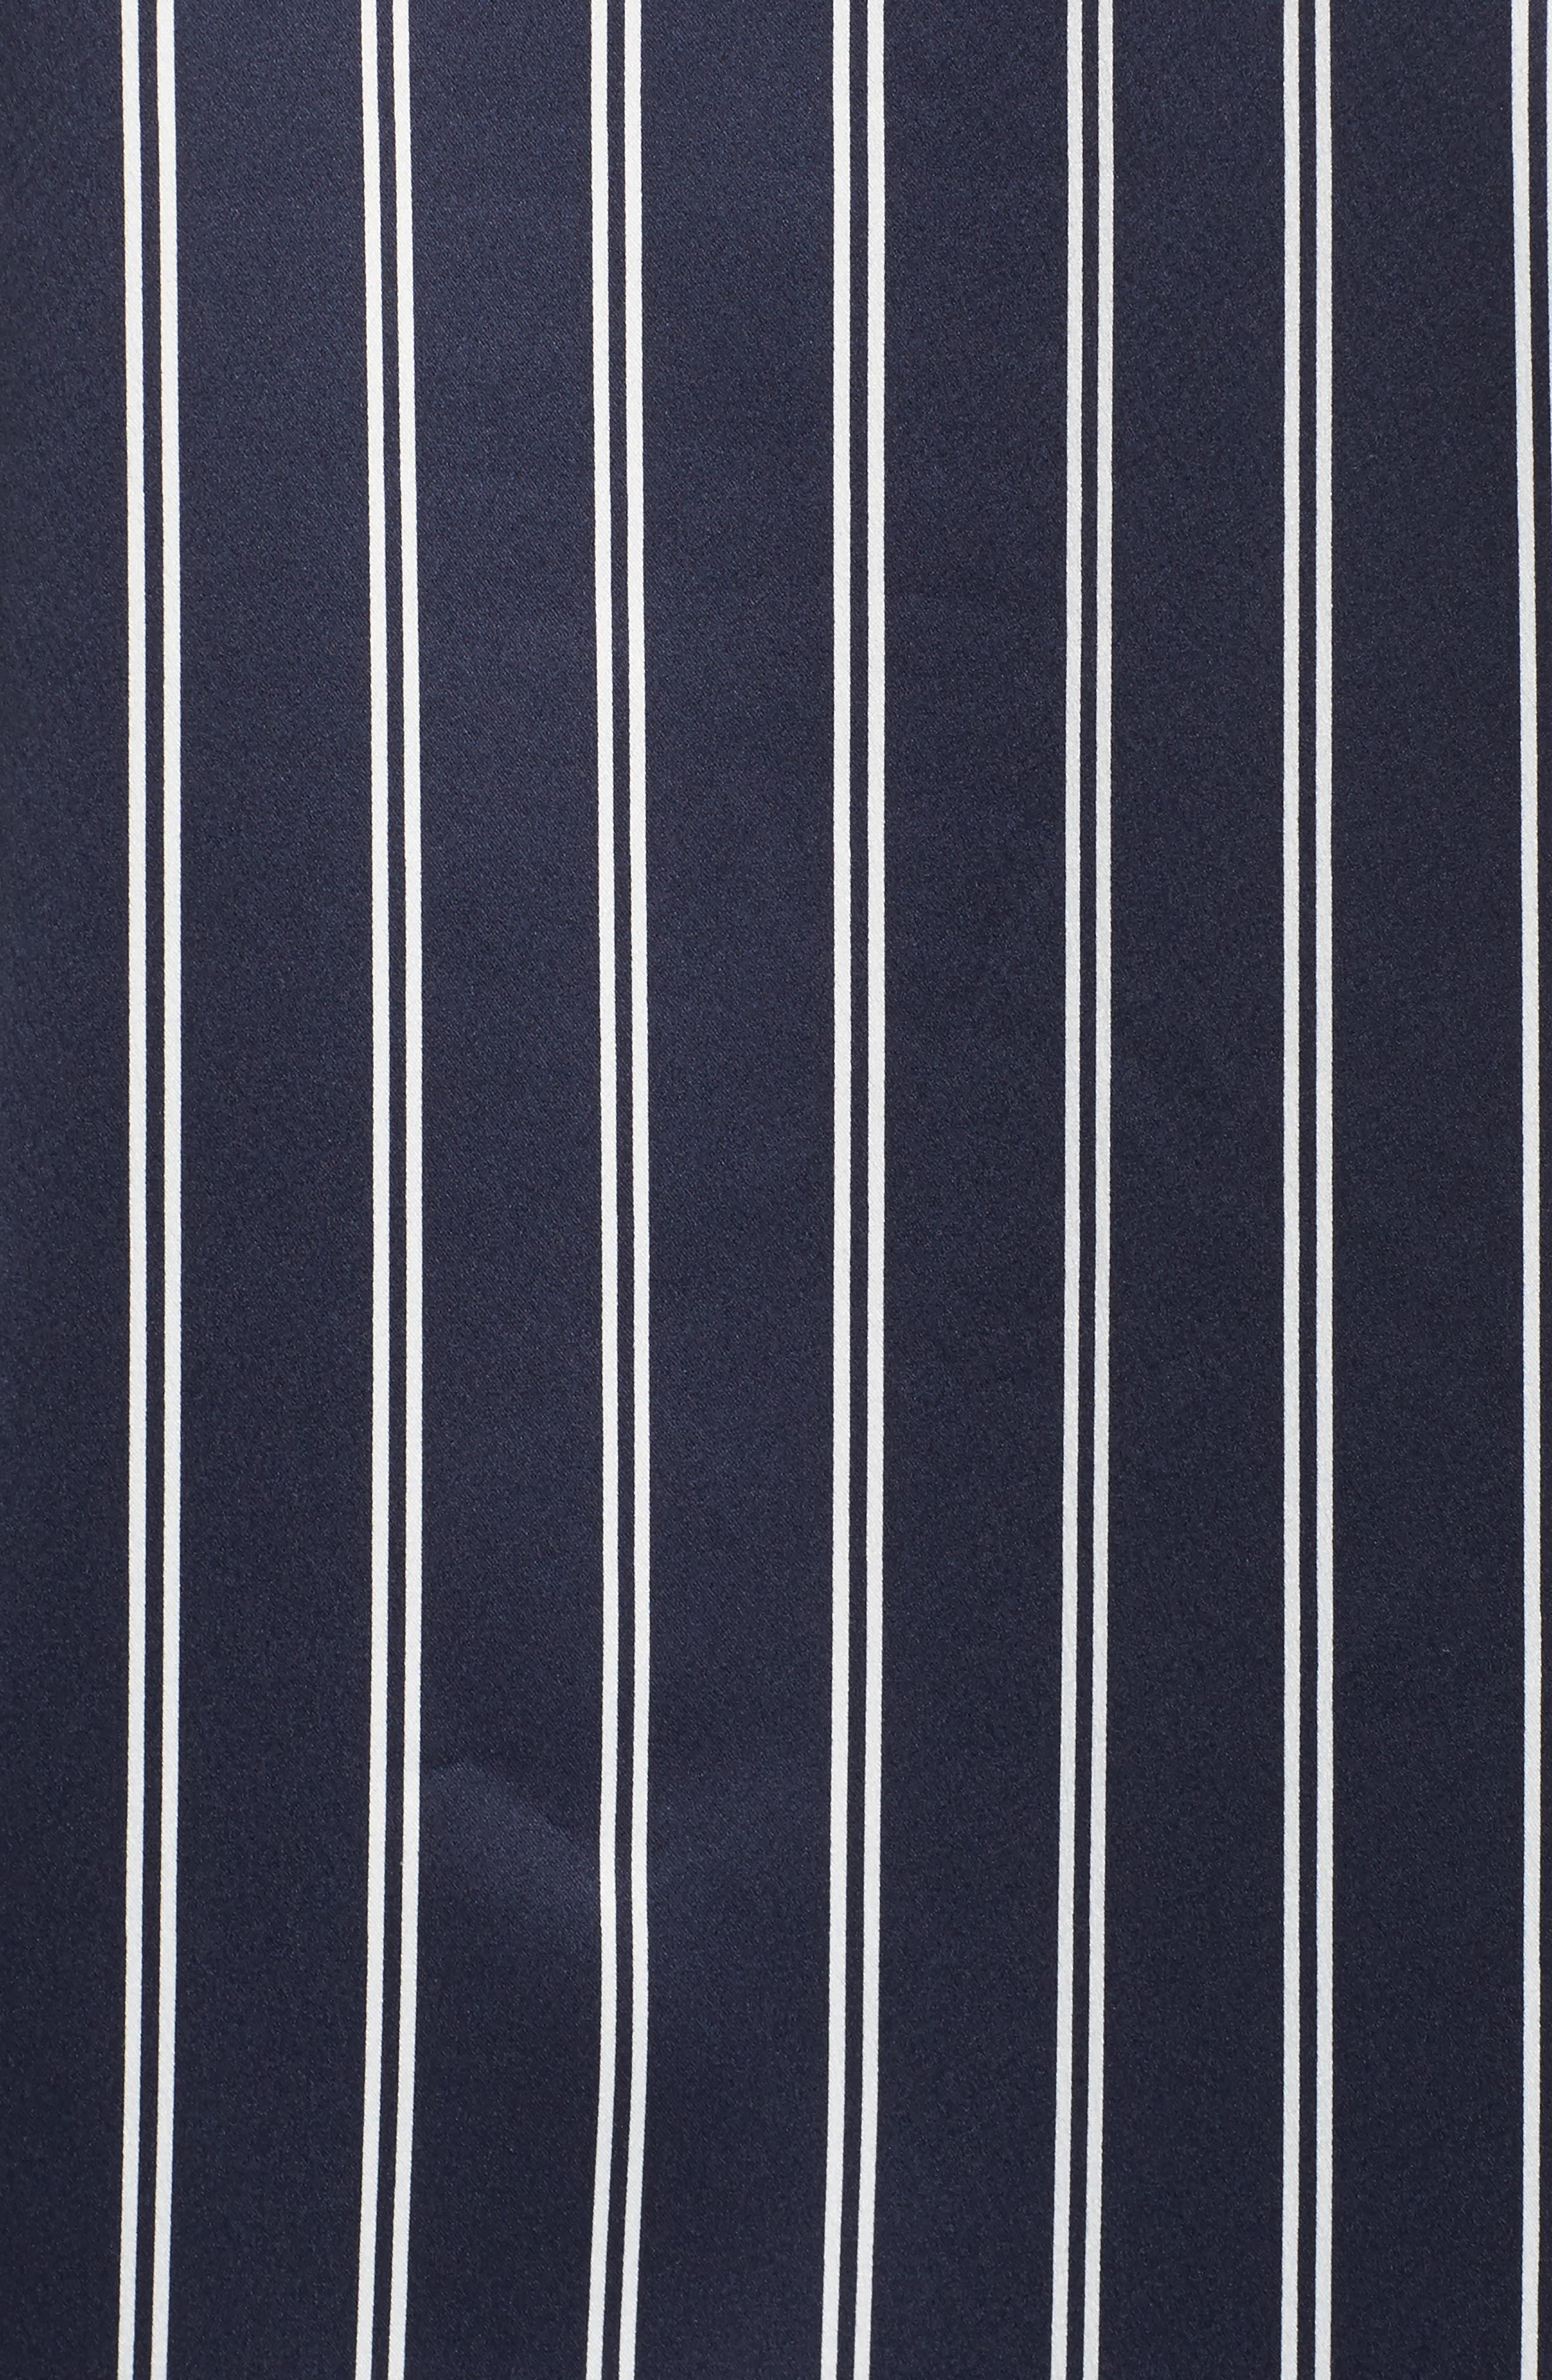 Satin Pajamas,                             Alternate thumbnail 5, color,                             Navy Stripe